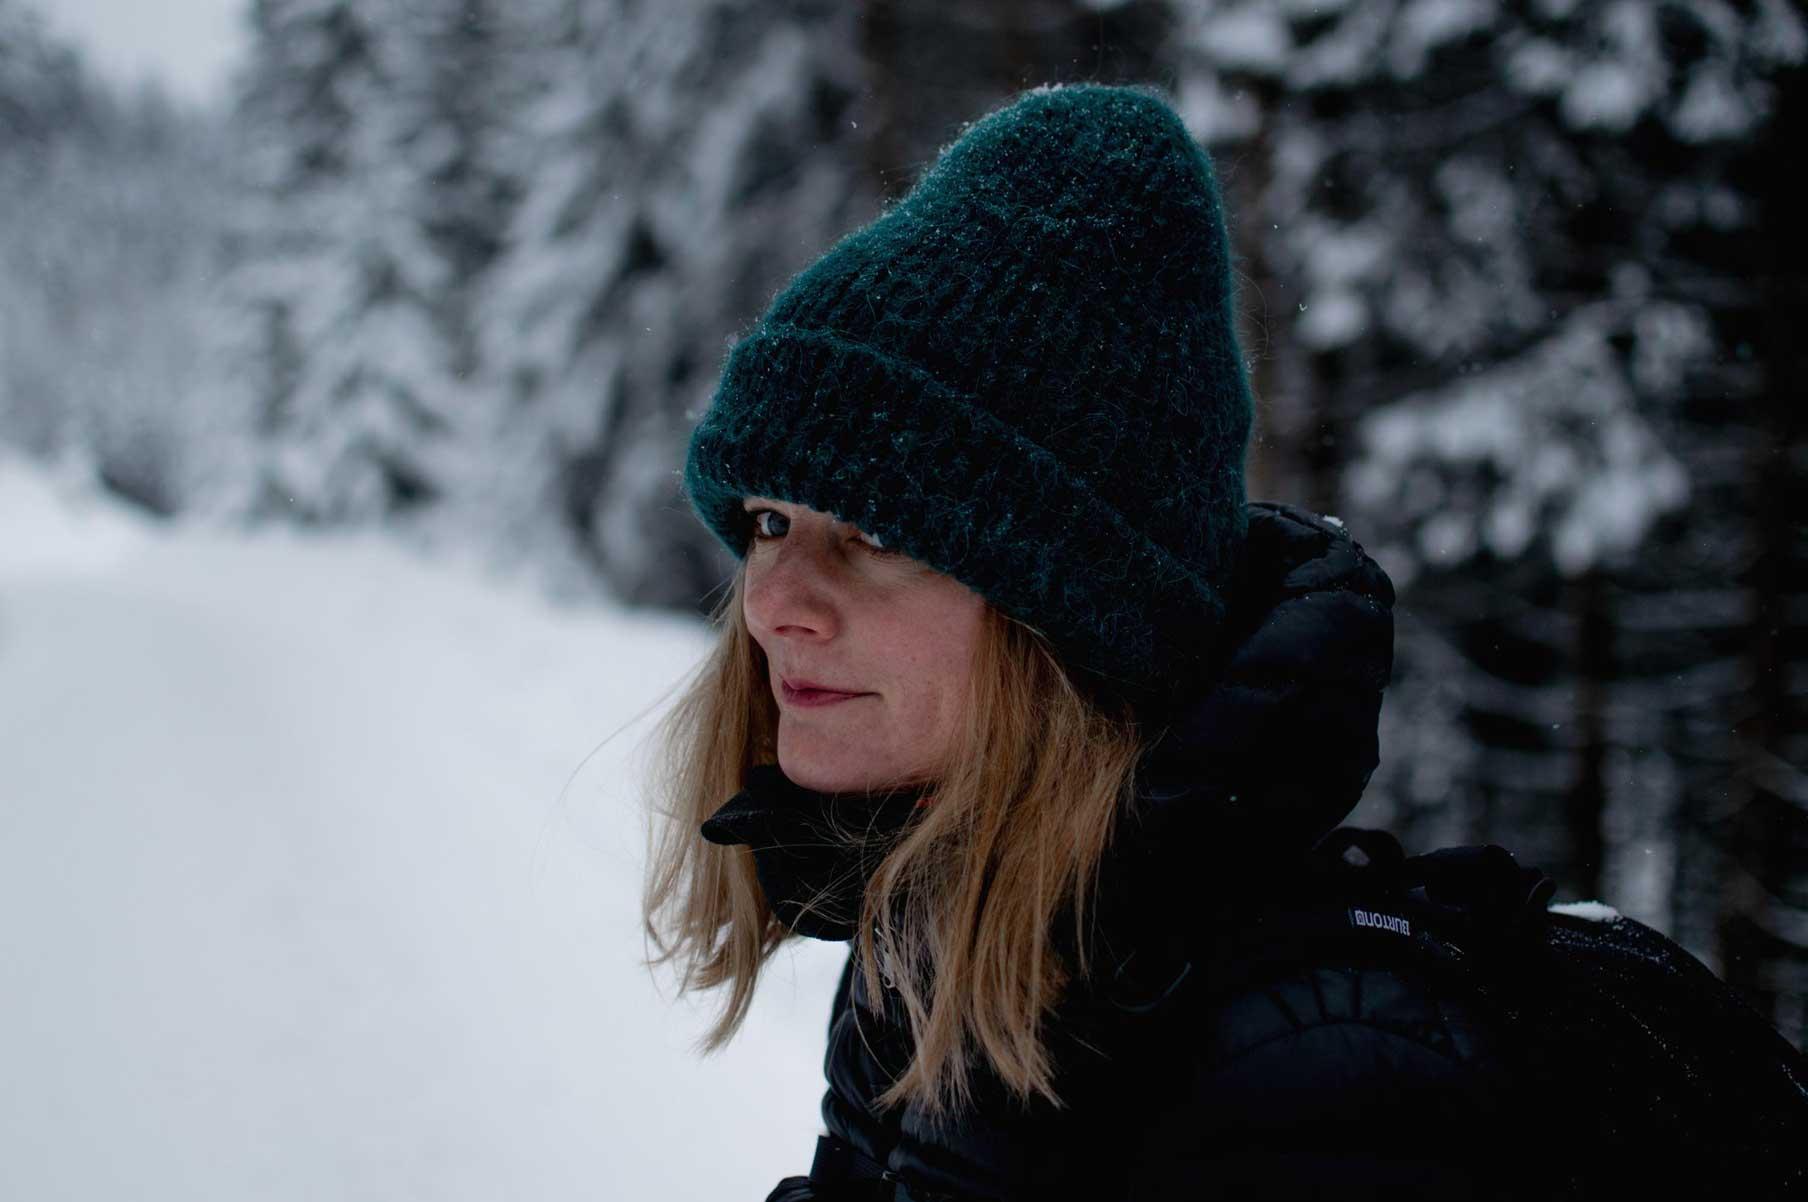 natalie-riedel-winter-nordkette